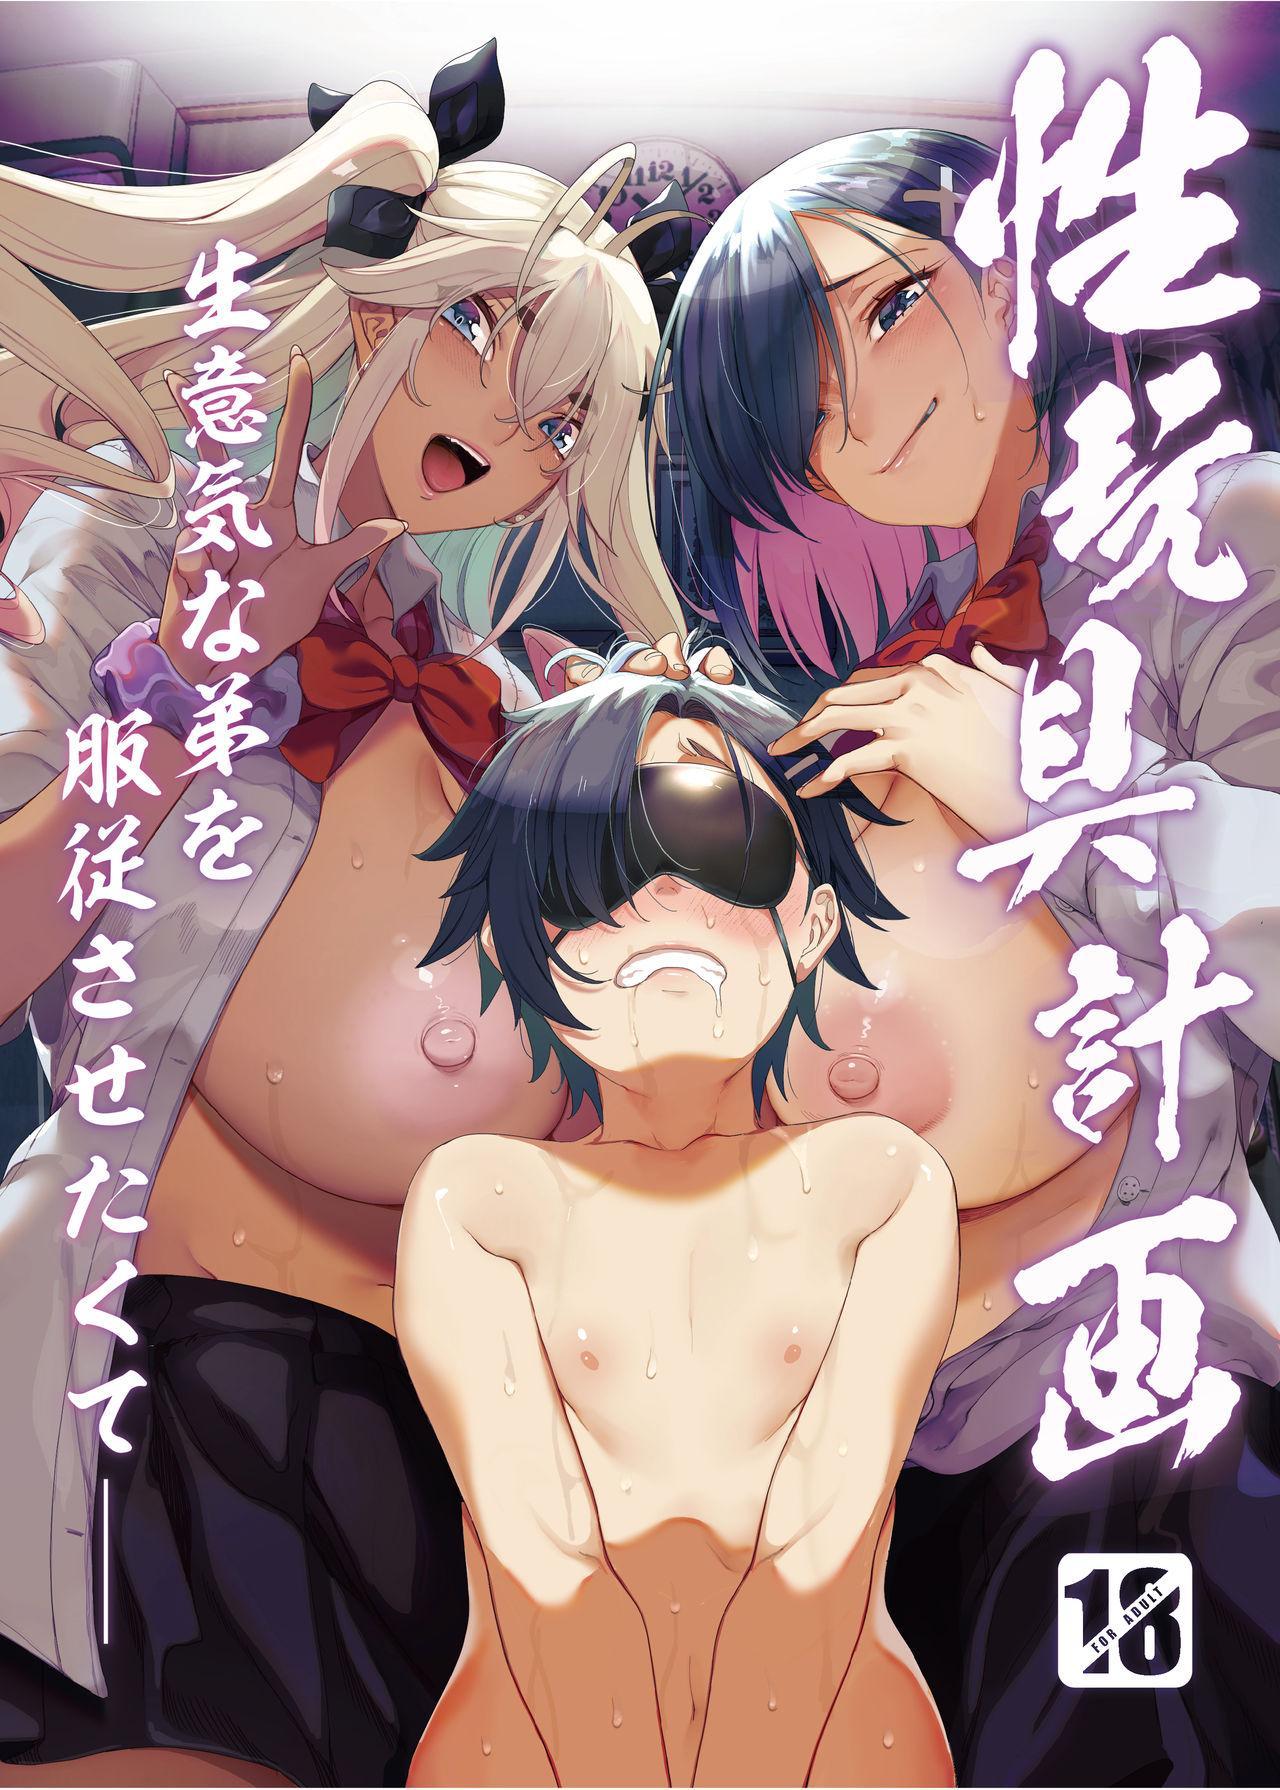 Seigangu Keikaku Namaiki na Otouto o Fukujuu sasetakute   I Want To Make My Cheeky Younger Brother Submit To Me Using Sex Toys 0